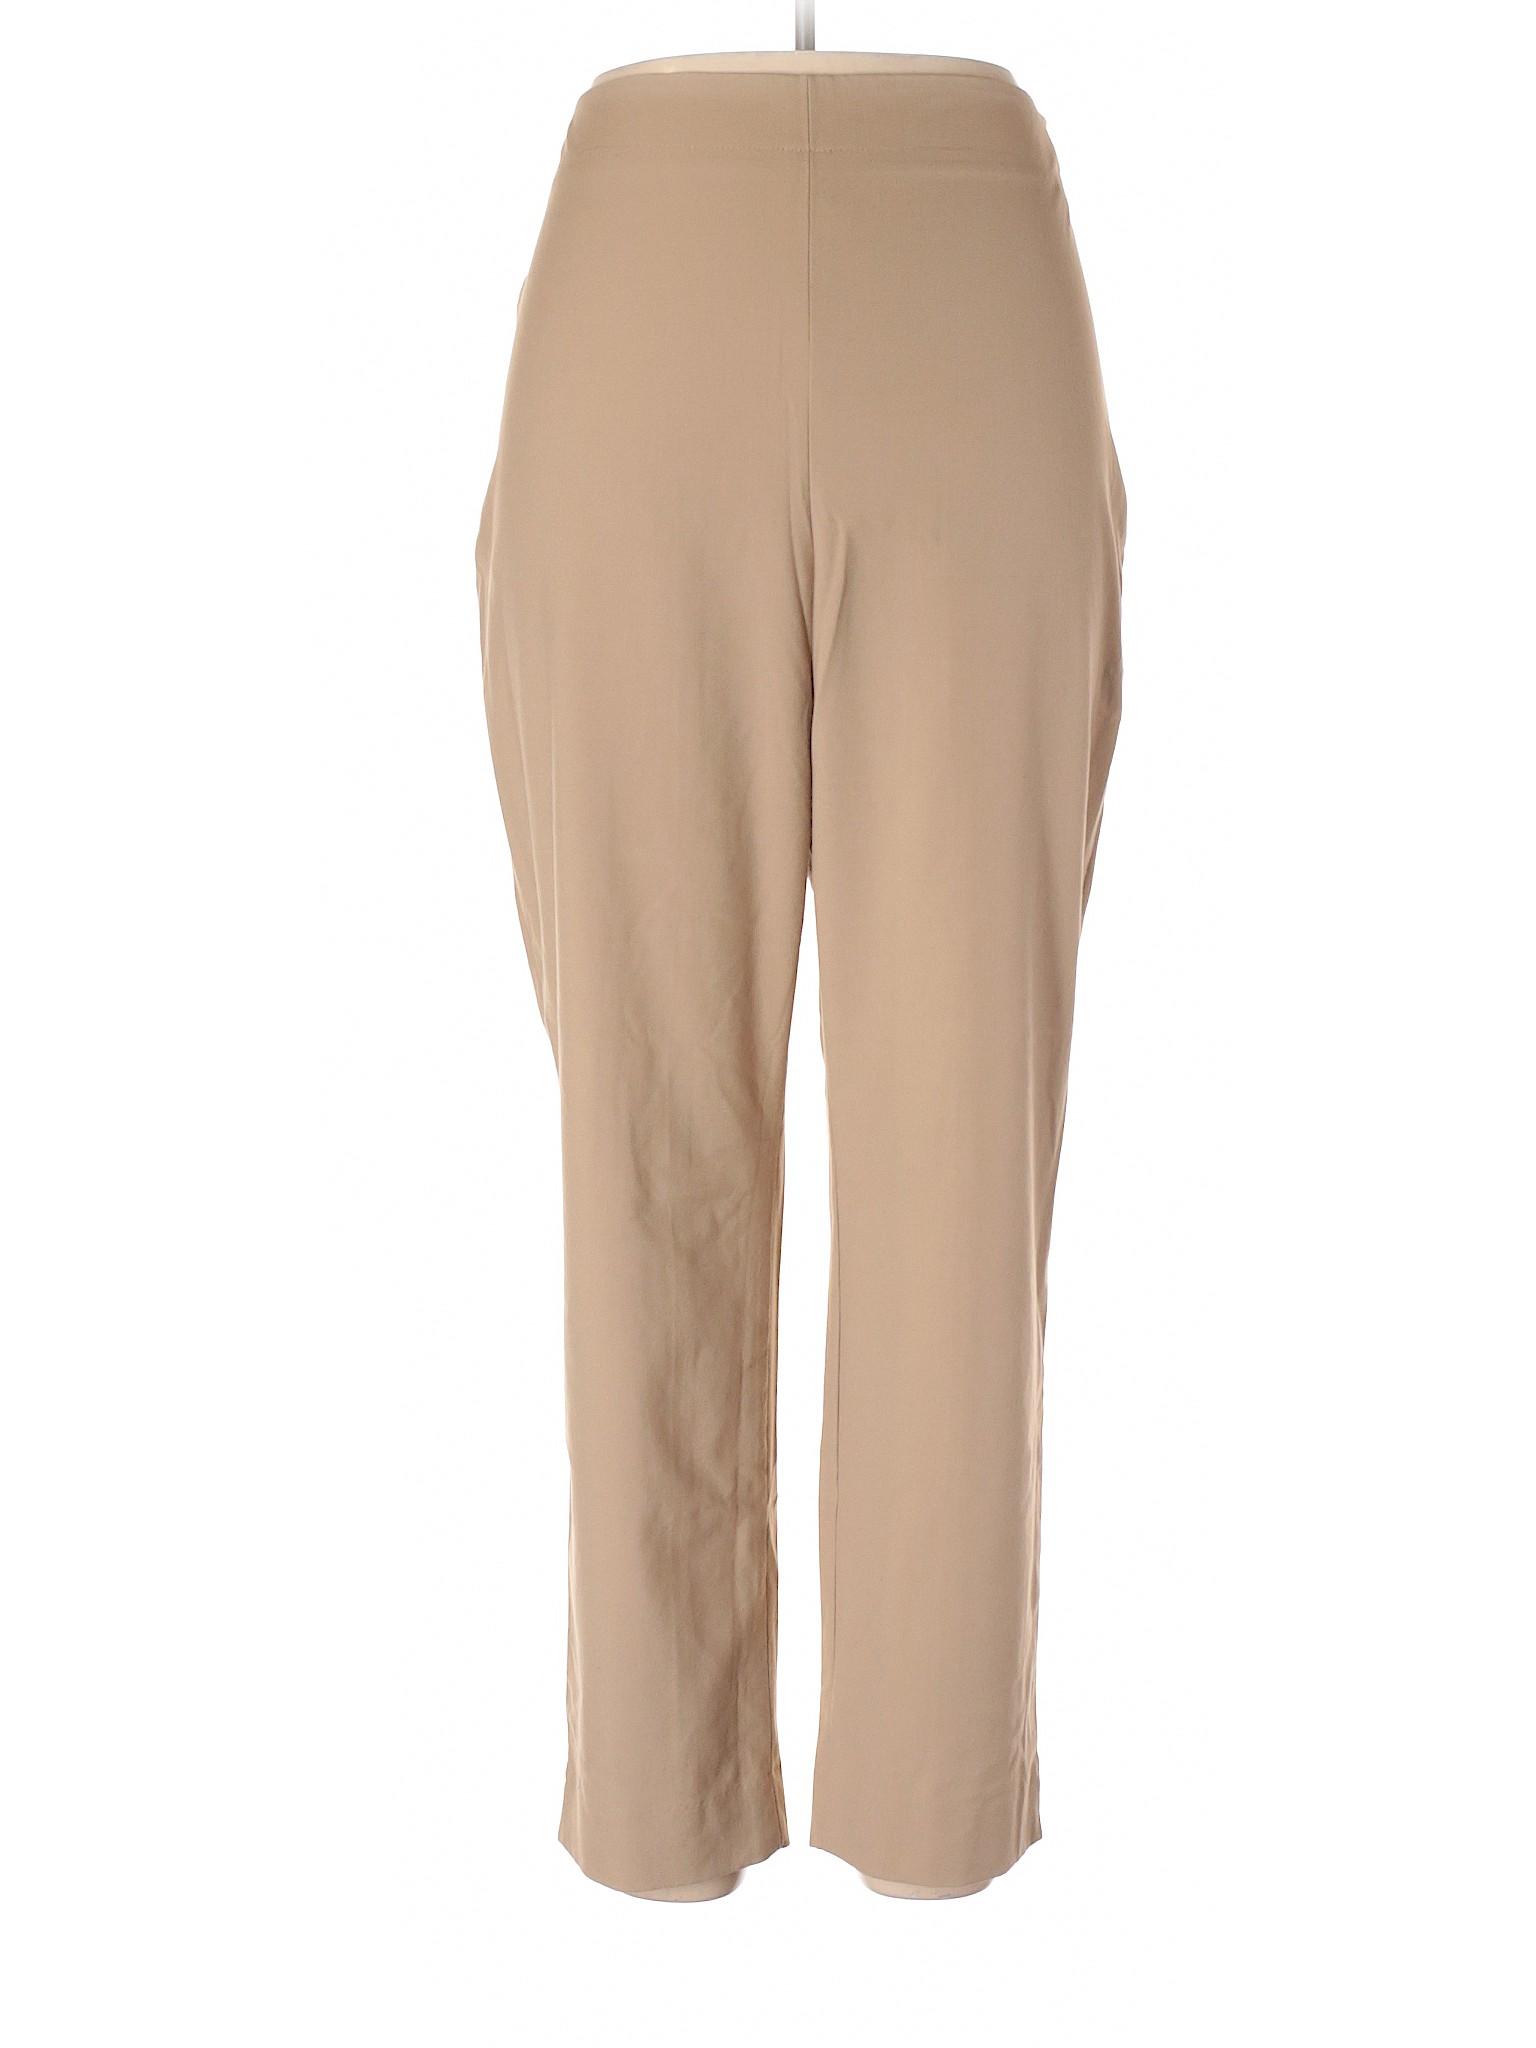 Pants Pants Dress Boutique winter winter Boutique Talbots Boutique Talbots Talbots winter Dress PdxqZ4pq